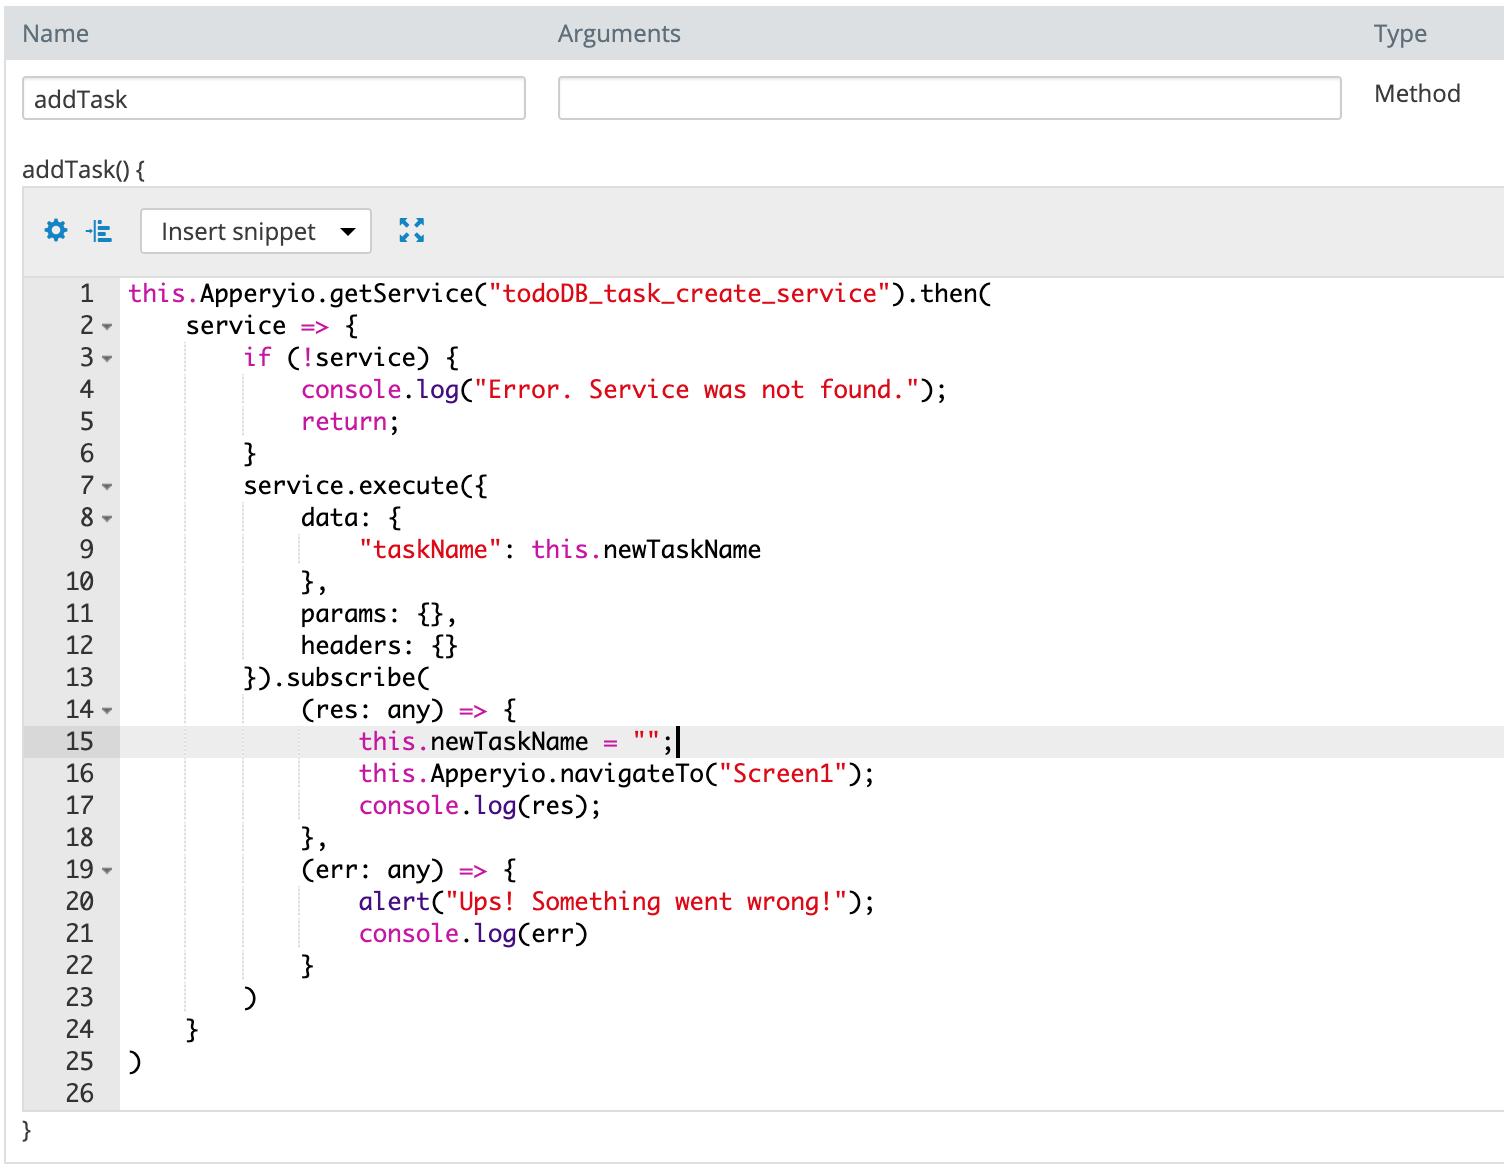 addTask code